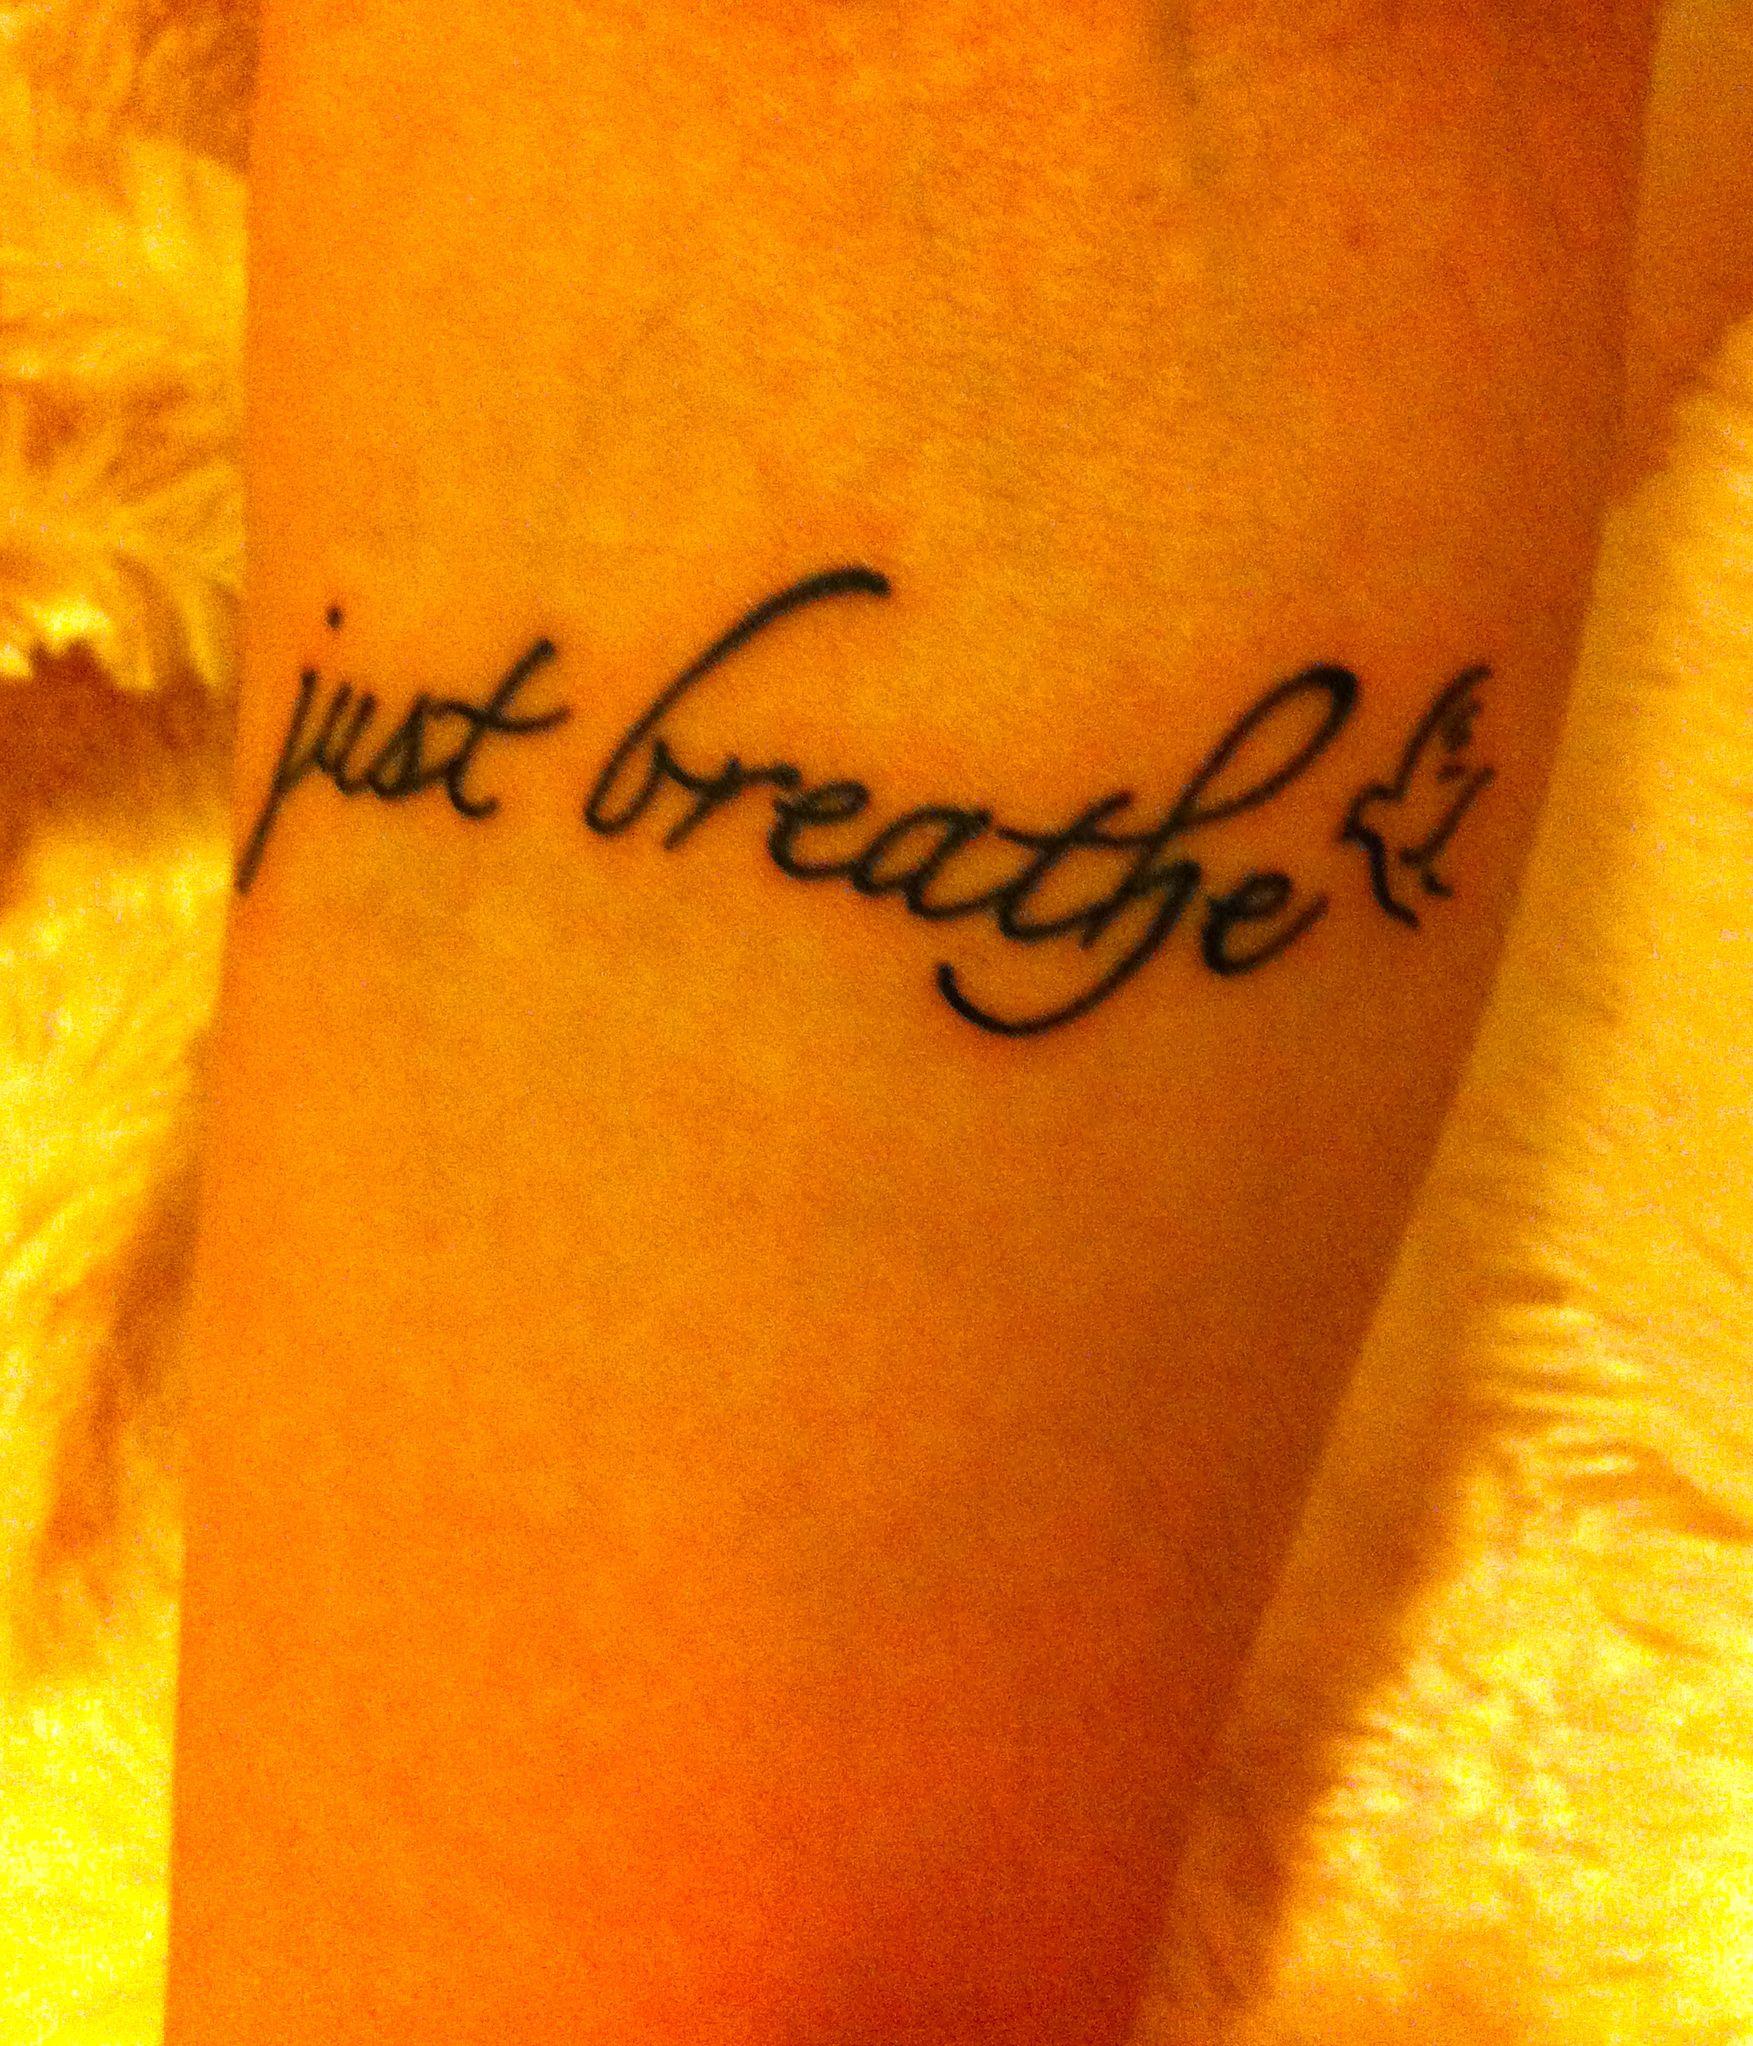 Just Breathe Tattoo Quarter Rest Instead Of The Bird